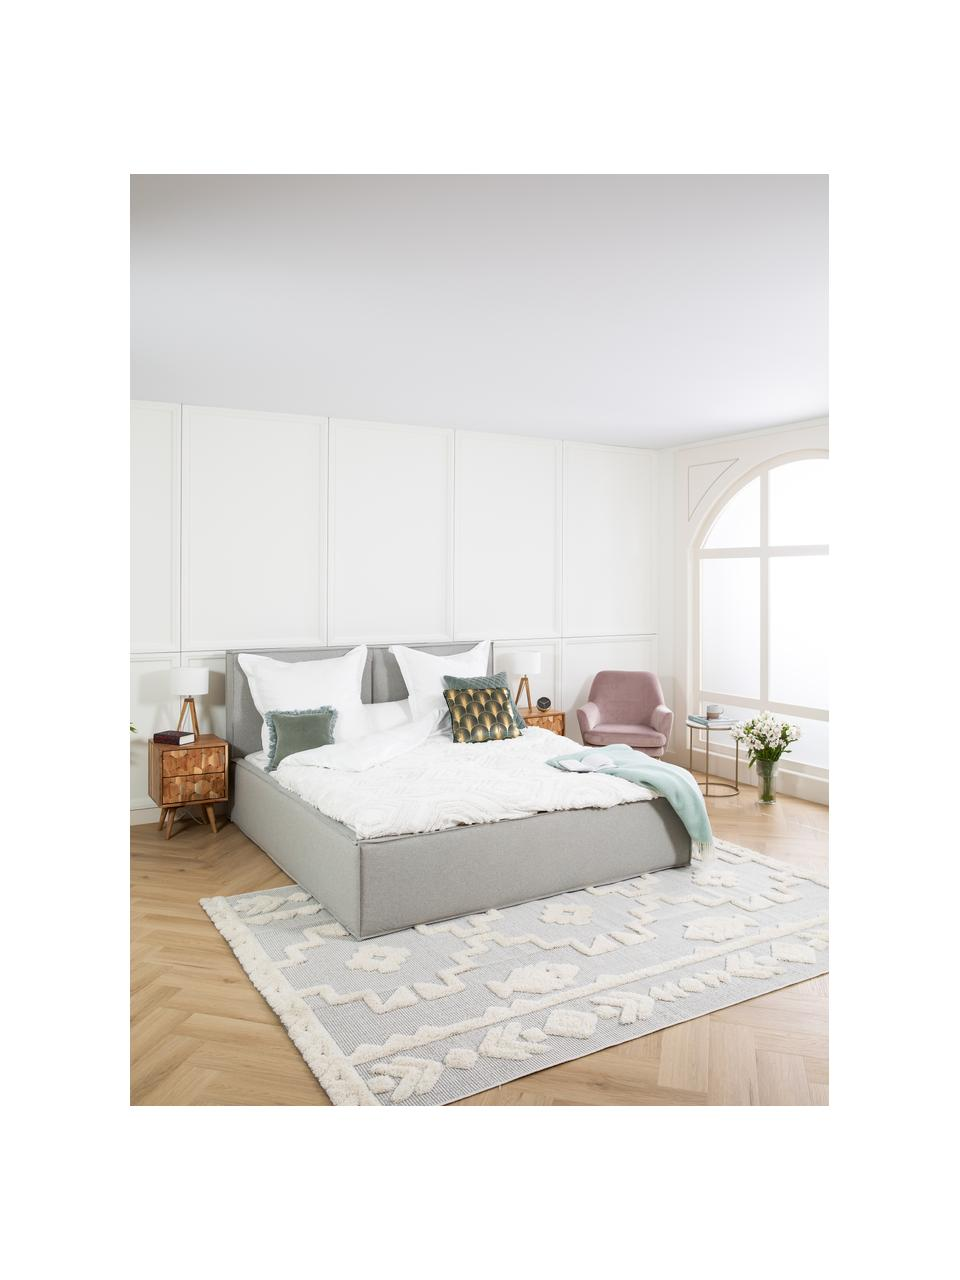 Polsterbett Dream in Hellgrau, Korpus: Massives Kiefernholz und , Bezug: Polyester (Strukturstoff), Webstoff Hellgrau, 180 x 200 cm